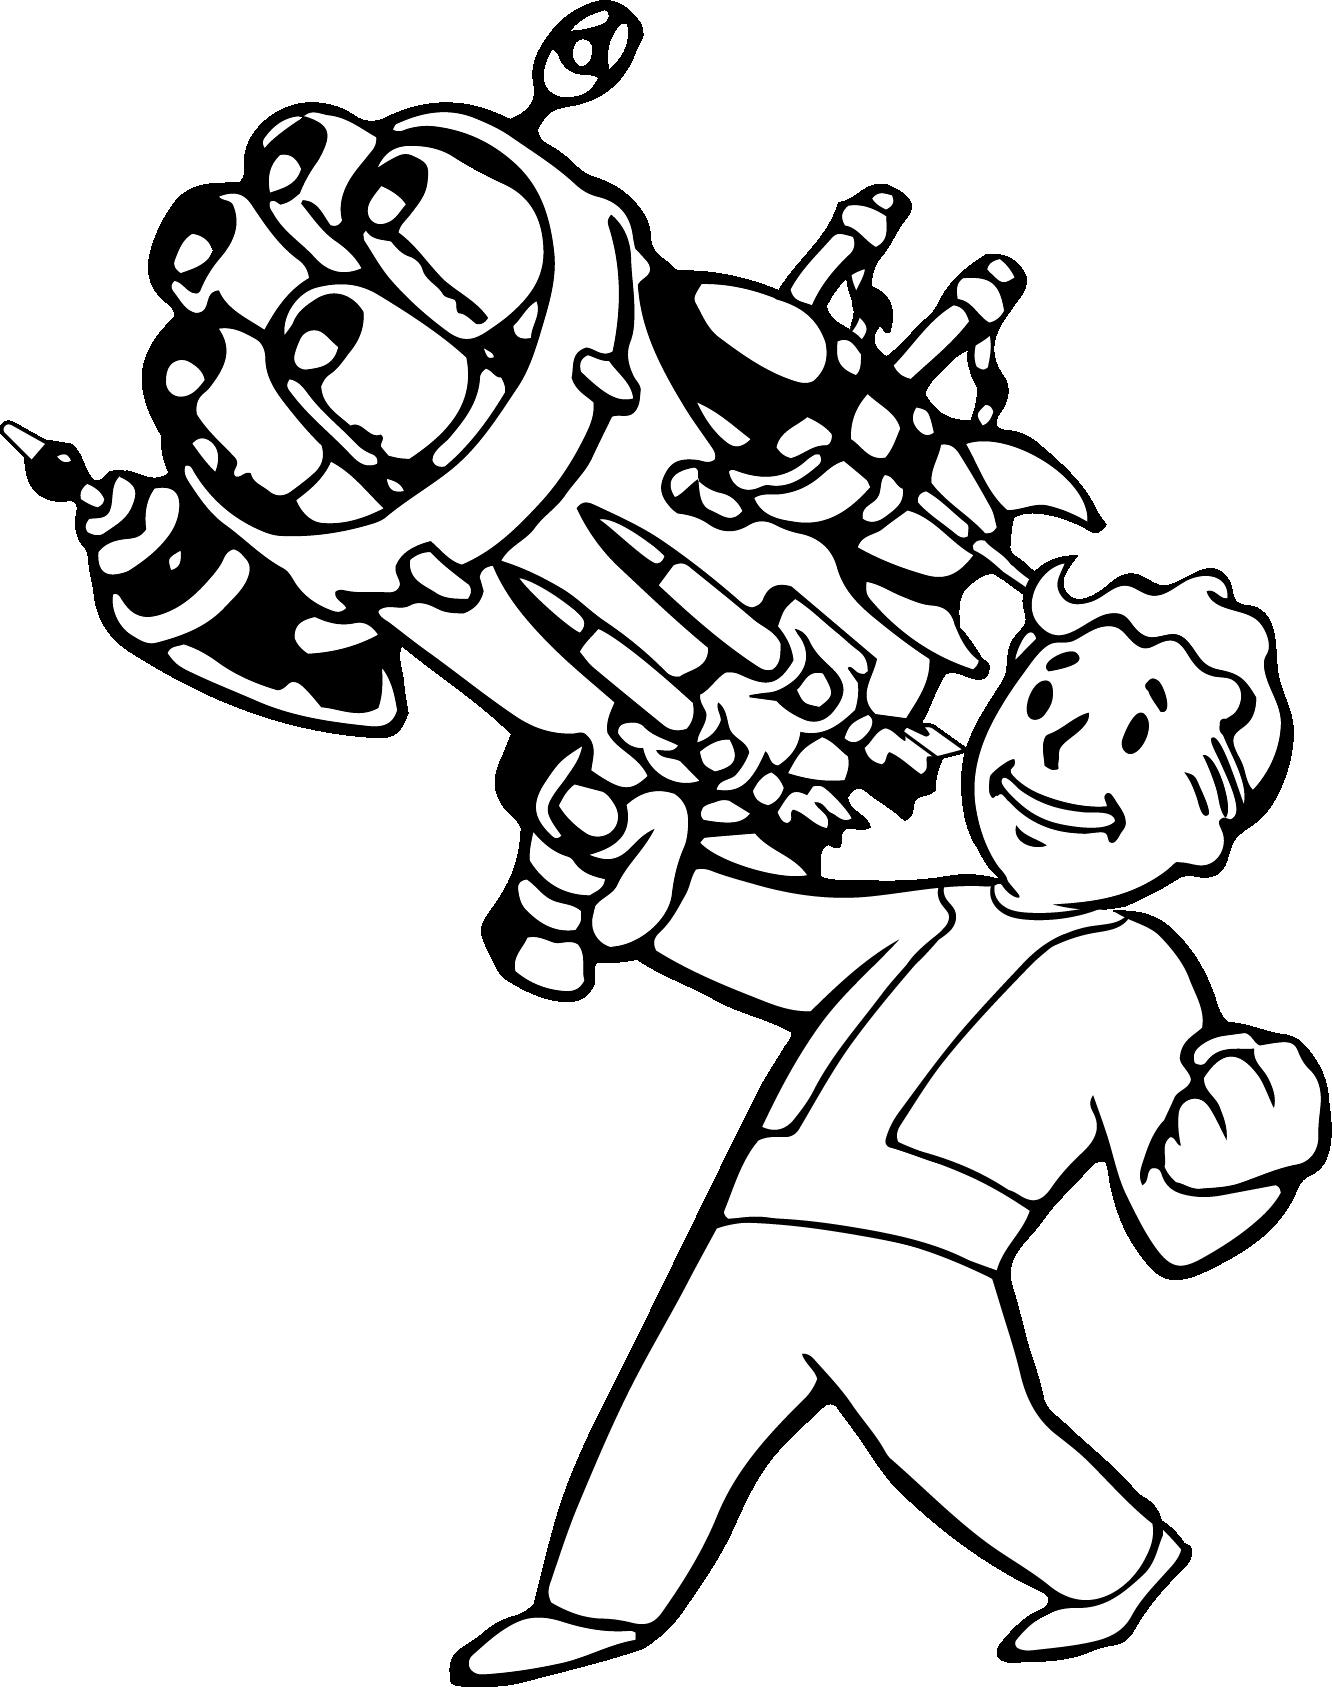 Weapon Handling